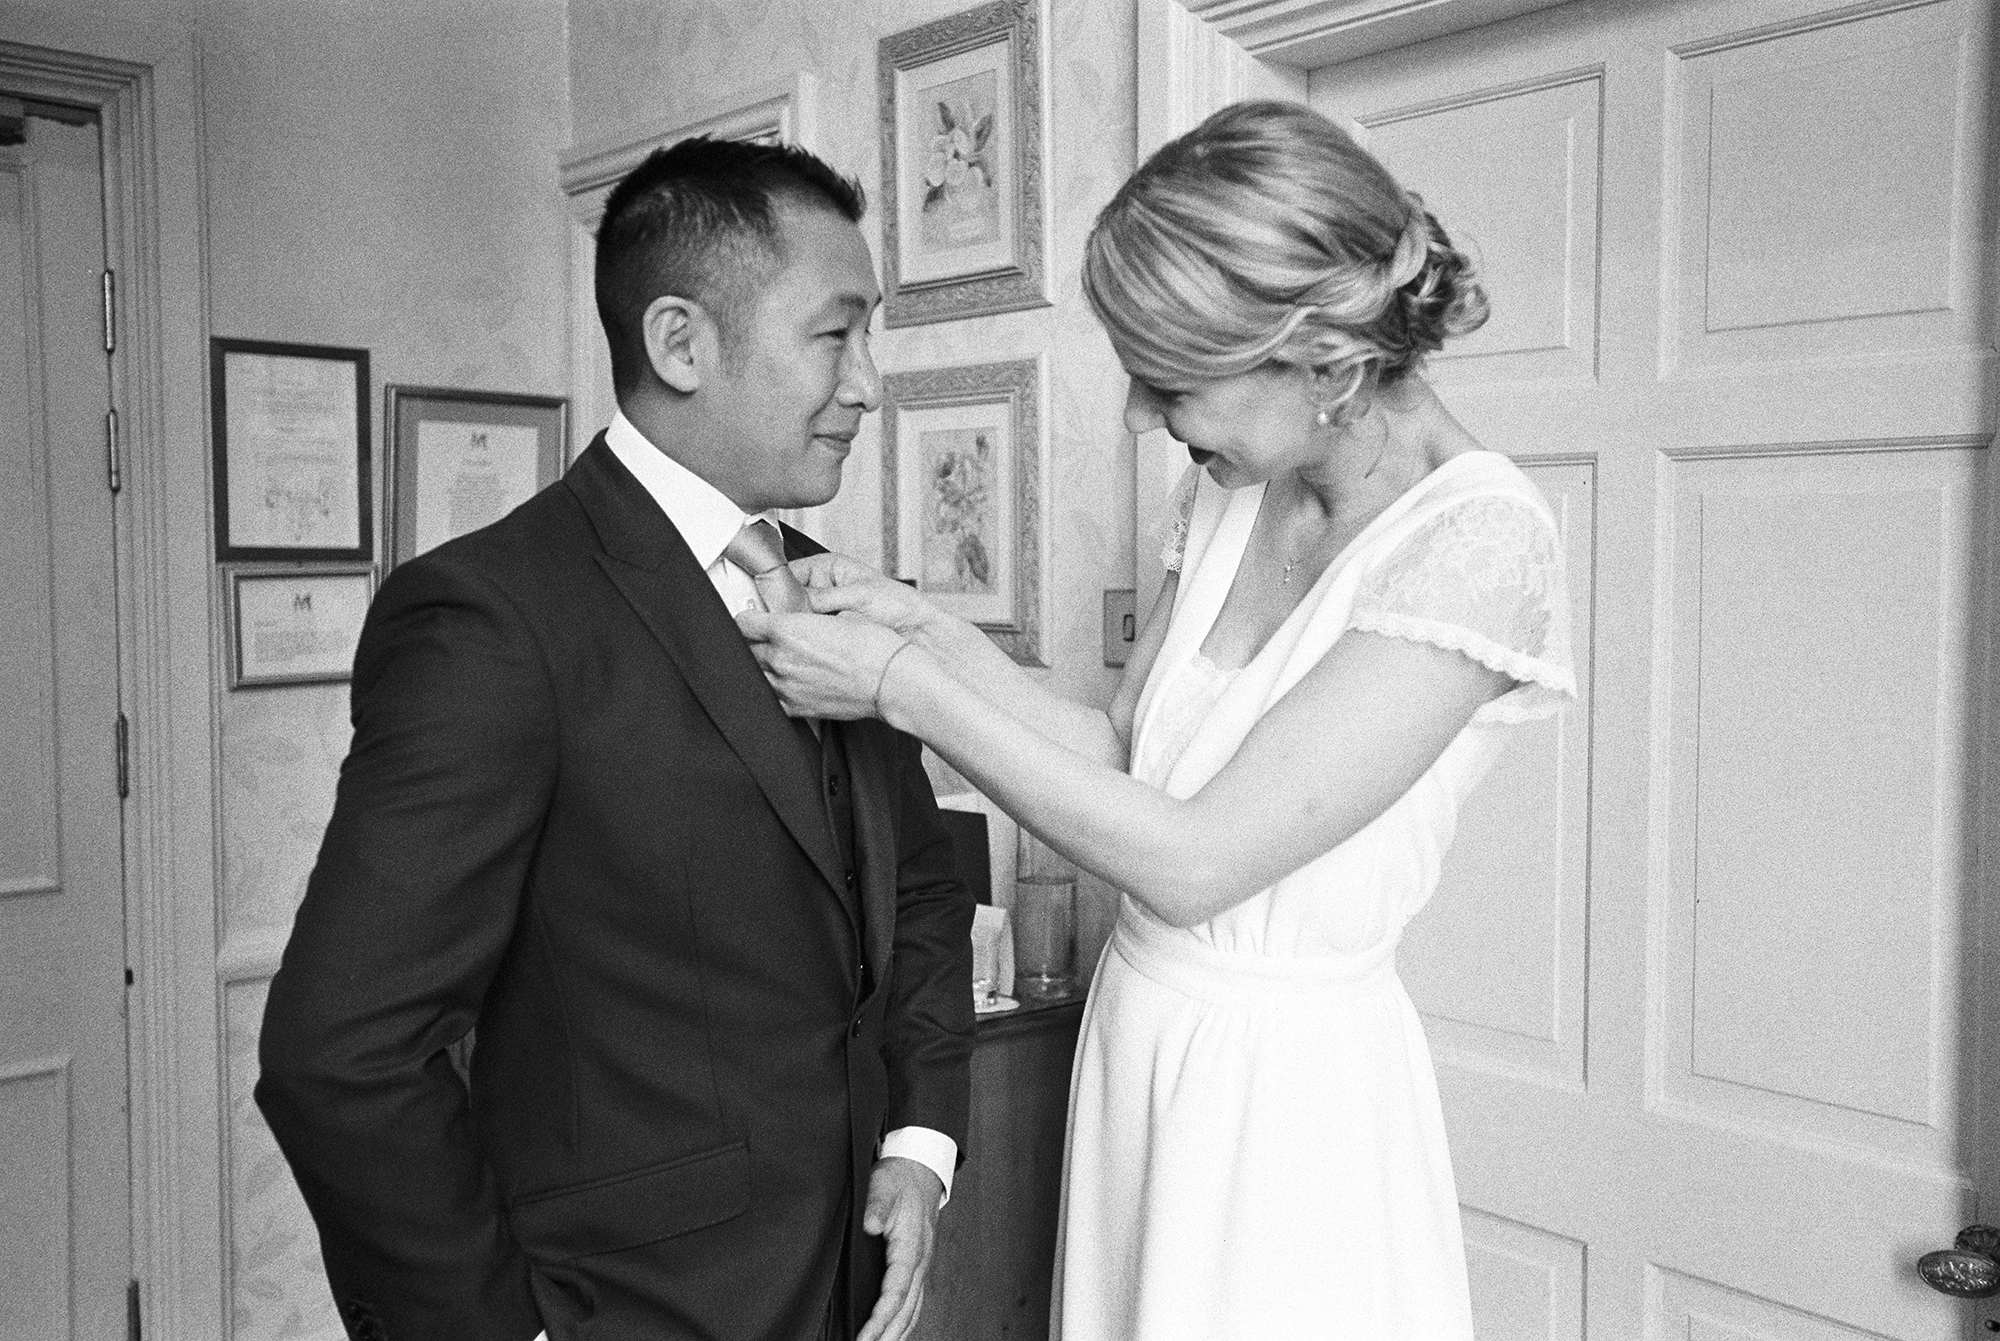 wedding_photographer_cumbria019.jpg